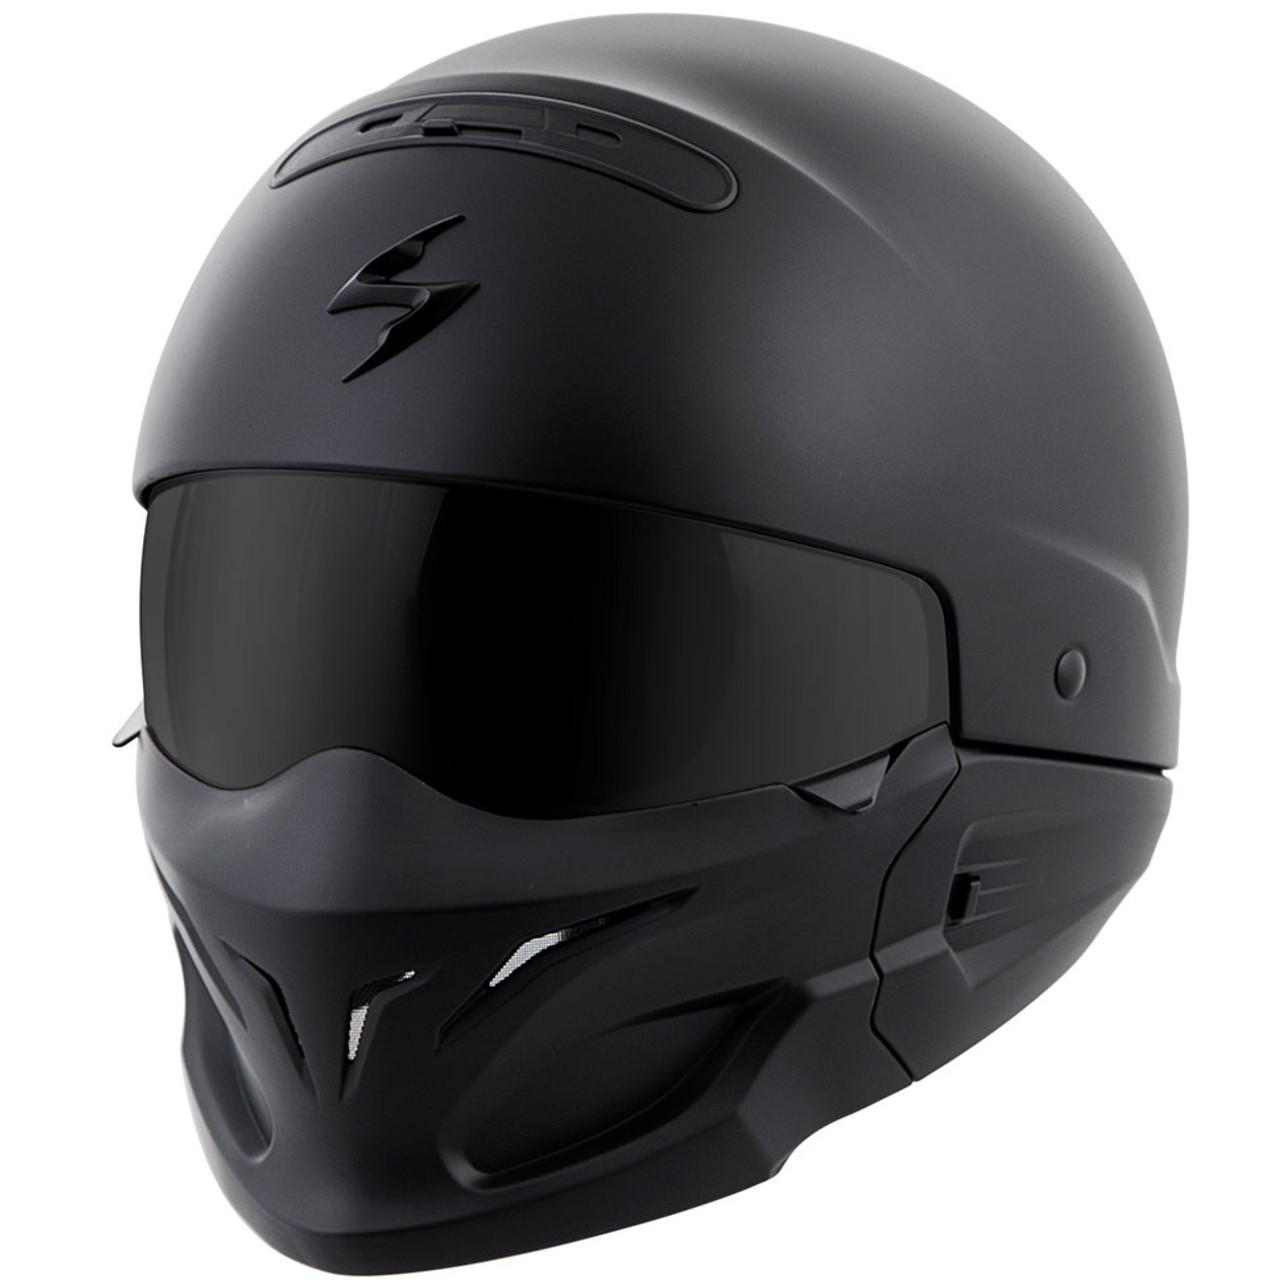 ed183688 Scorpion Covert Convertible Modular Motorcycle Helmet - Get Lowered Cycles